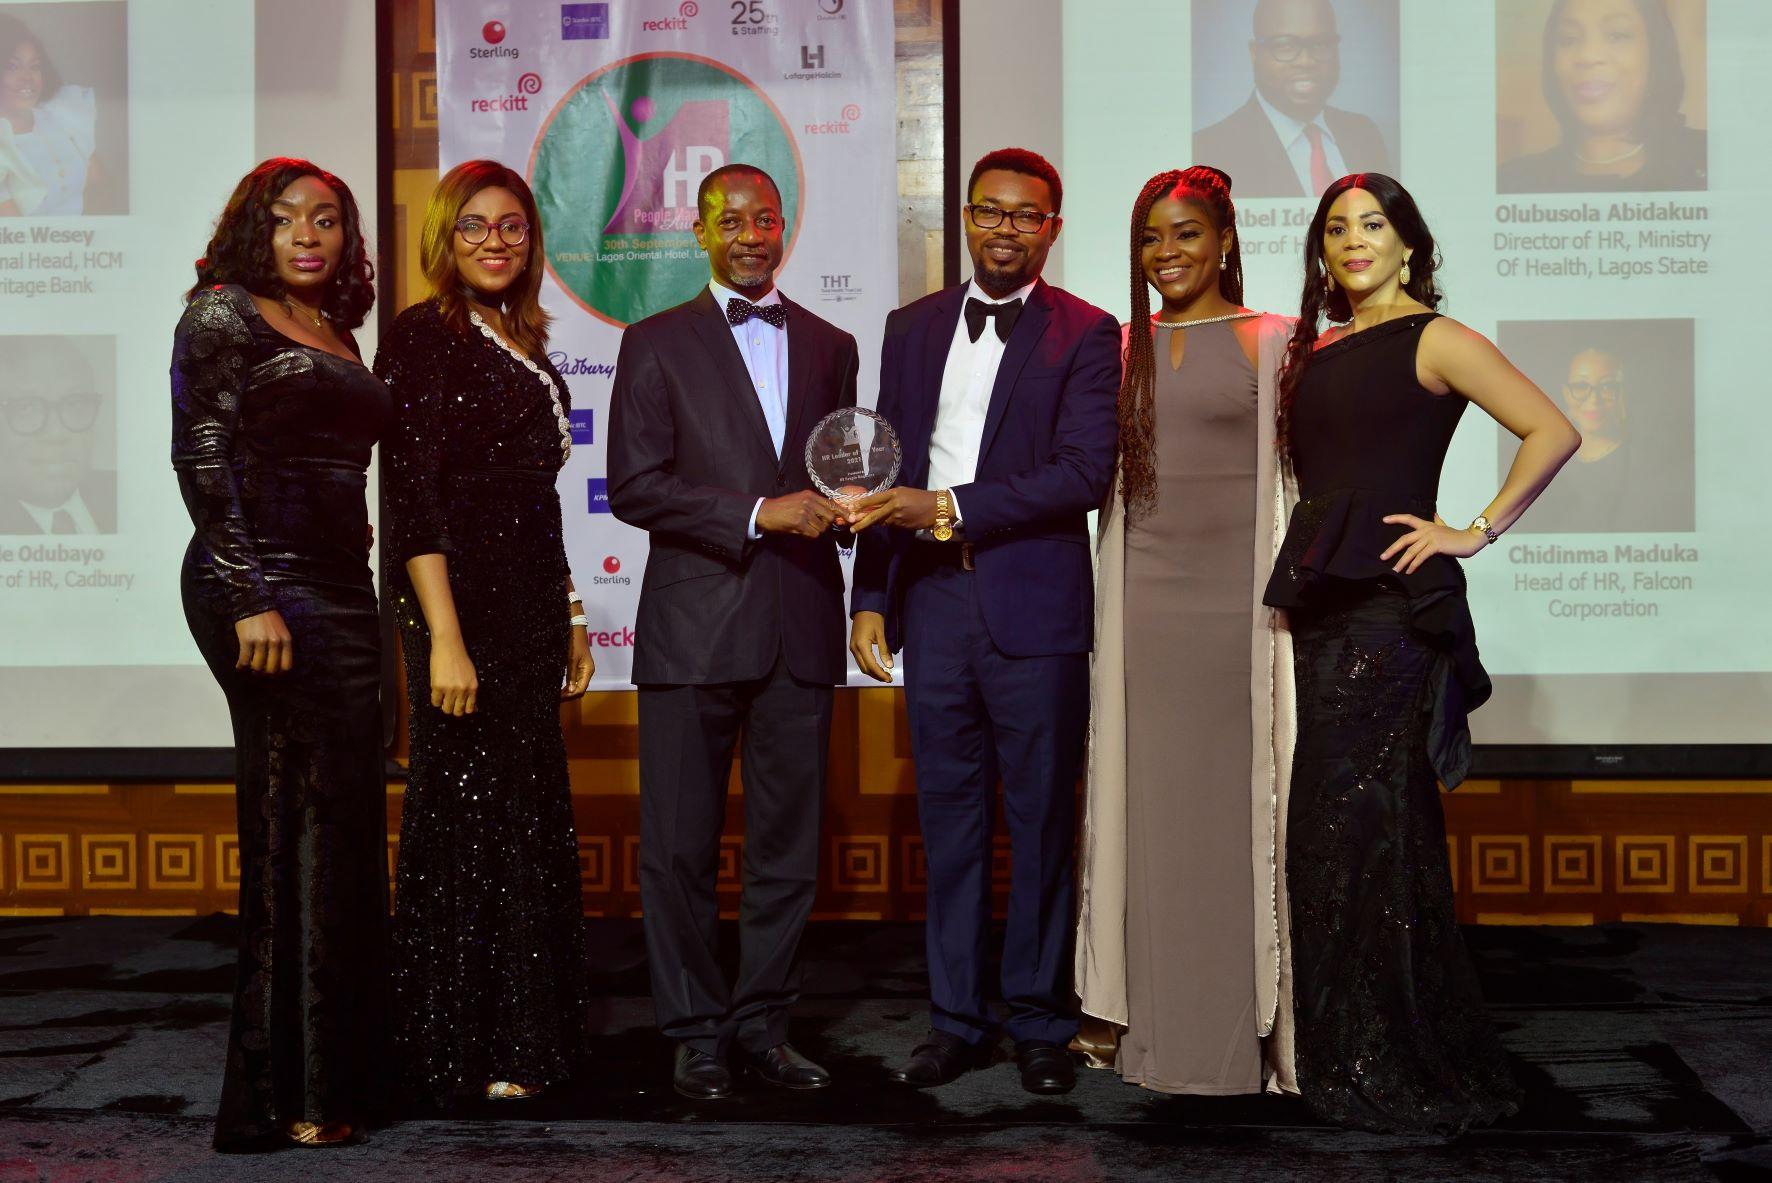 Heritage Bank People Magazine FICAN Awards